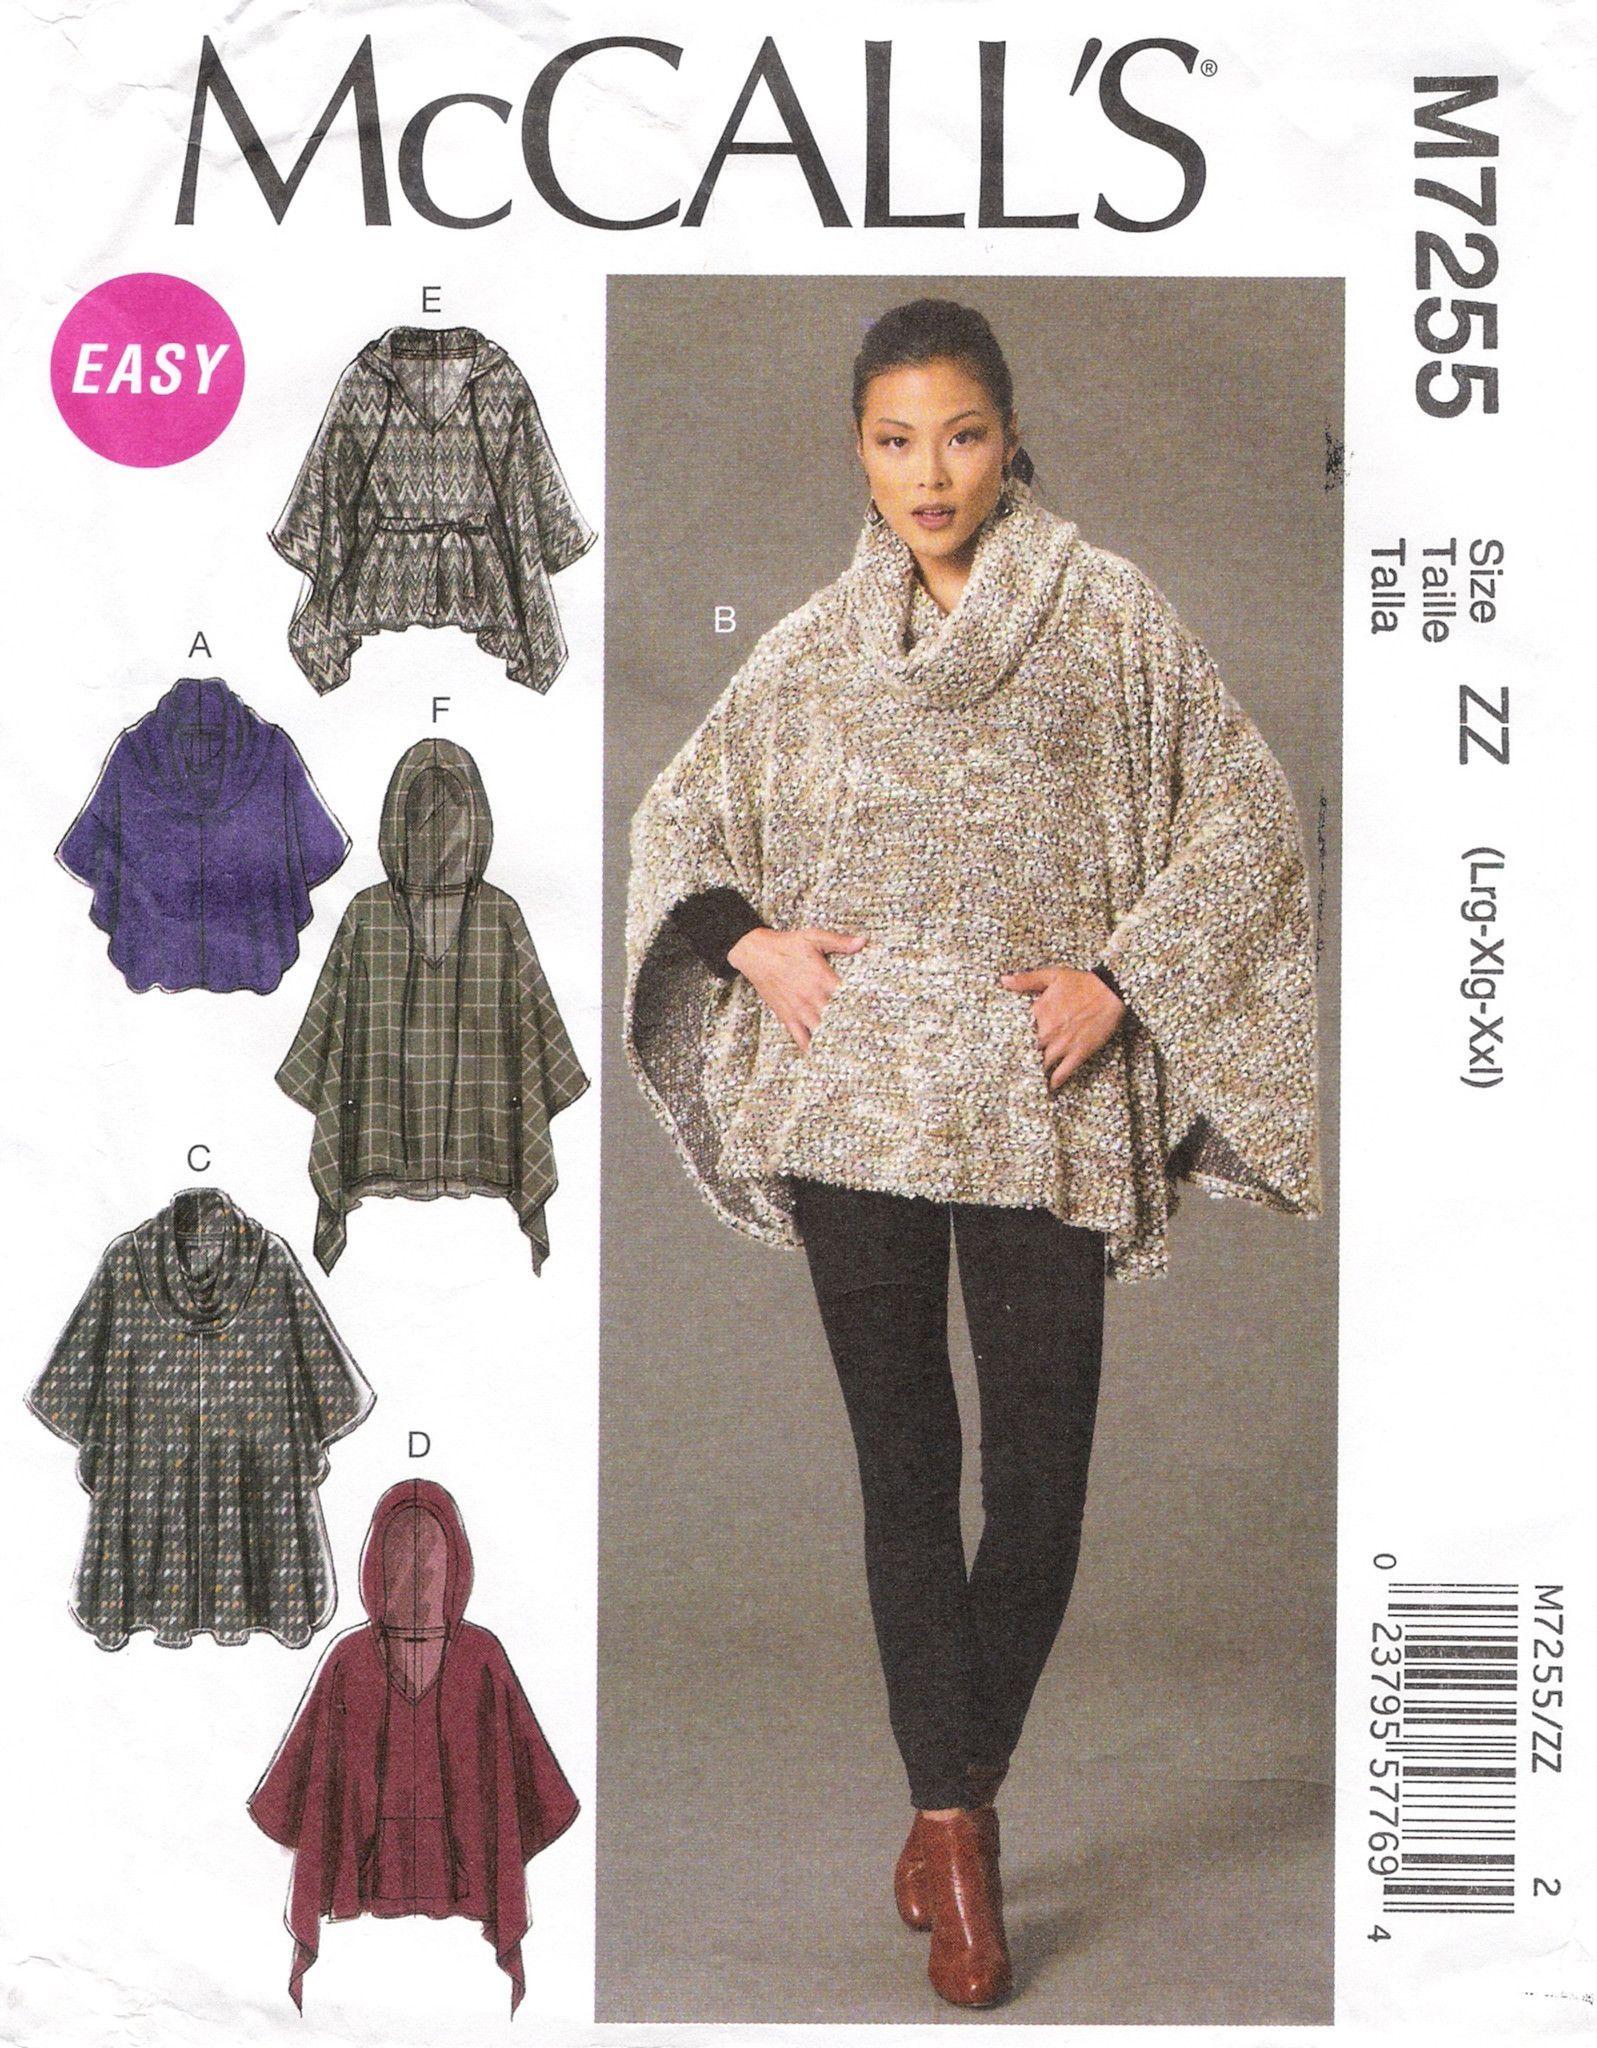 McCalls Ladies Easy Sewing Pattern 6209 Ponchos /& Belt McCalls-6209-M